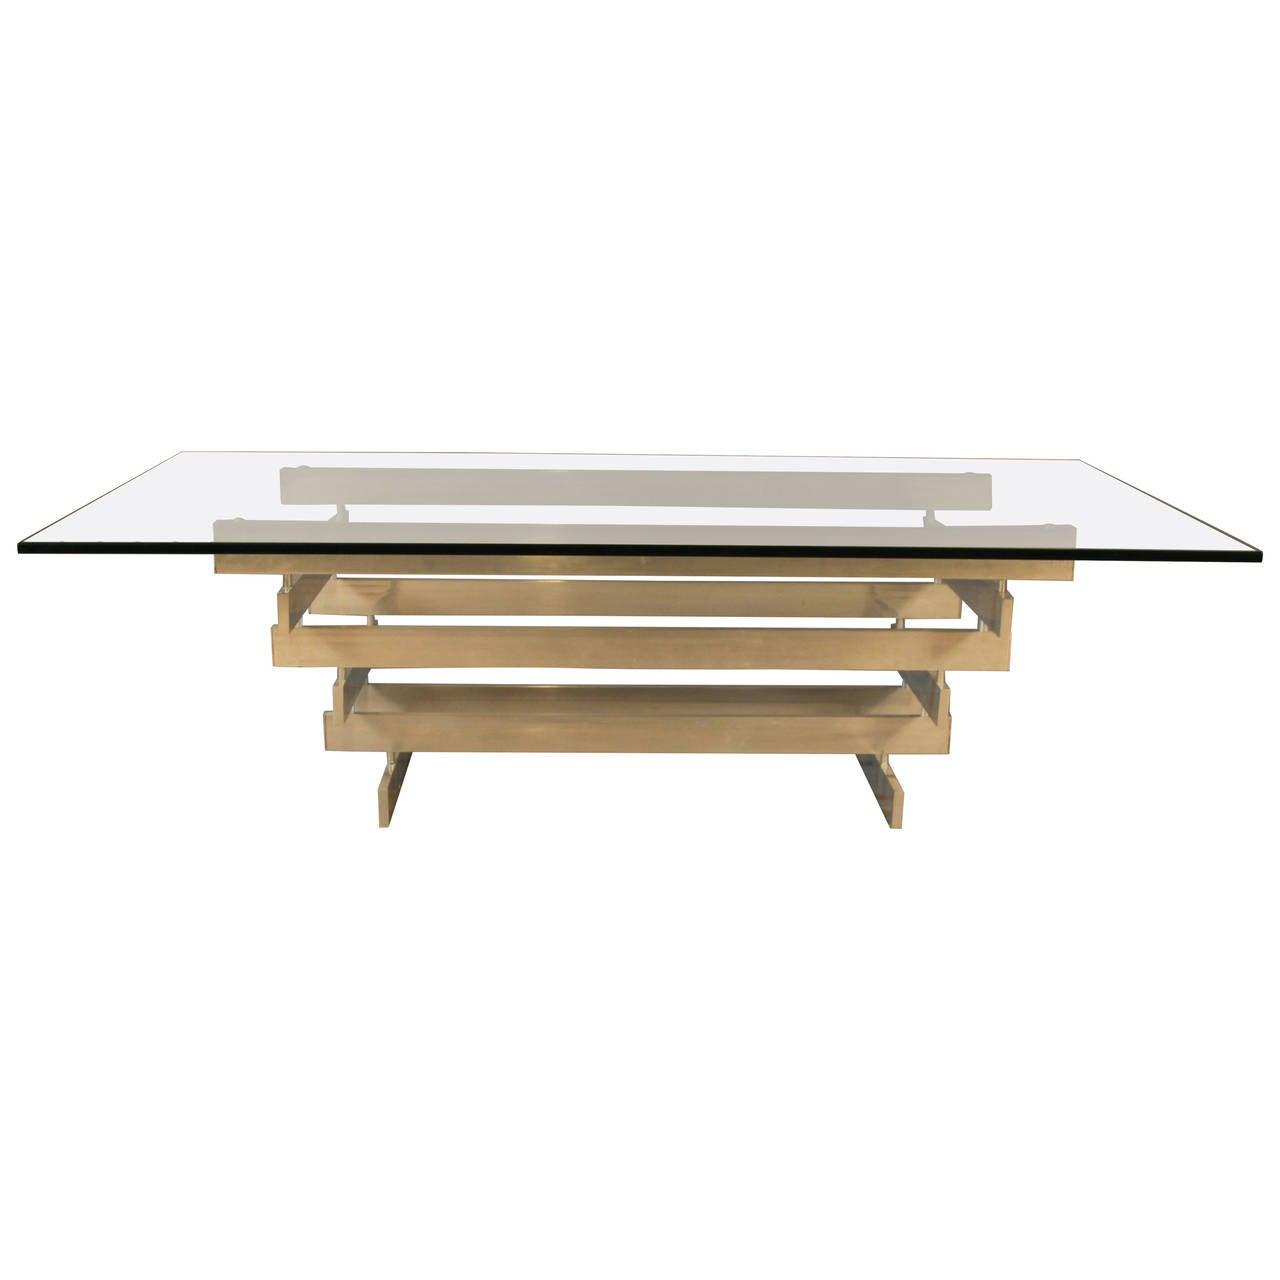 Paul Mayen Multi Tiered Aluminum Coffee Table For Habitat At 1stdibs